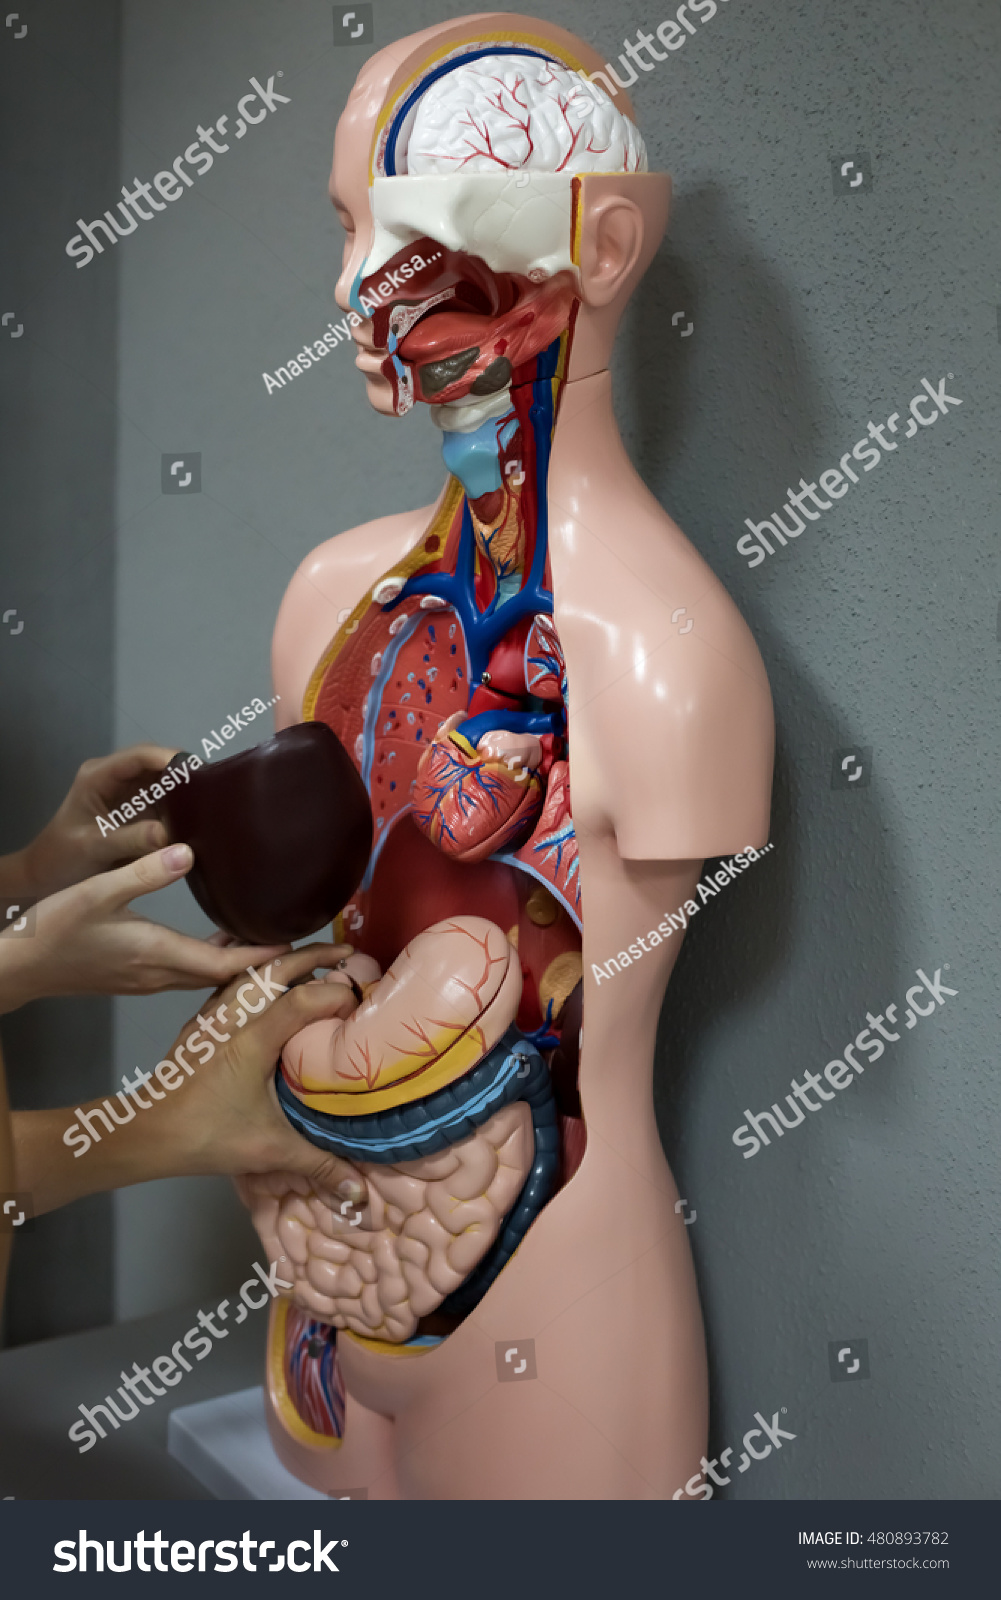 Human Anatomy Mannequin Stock Photo Edit Now 480893782 Shutterstock